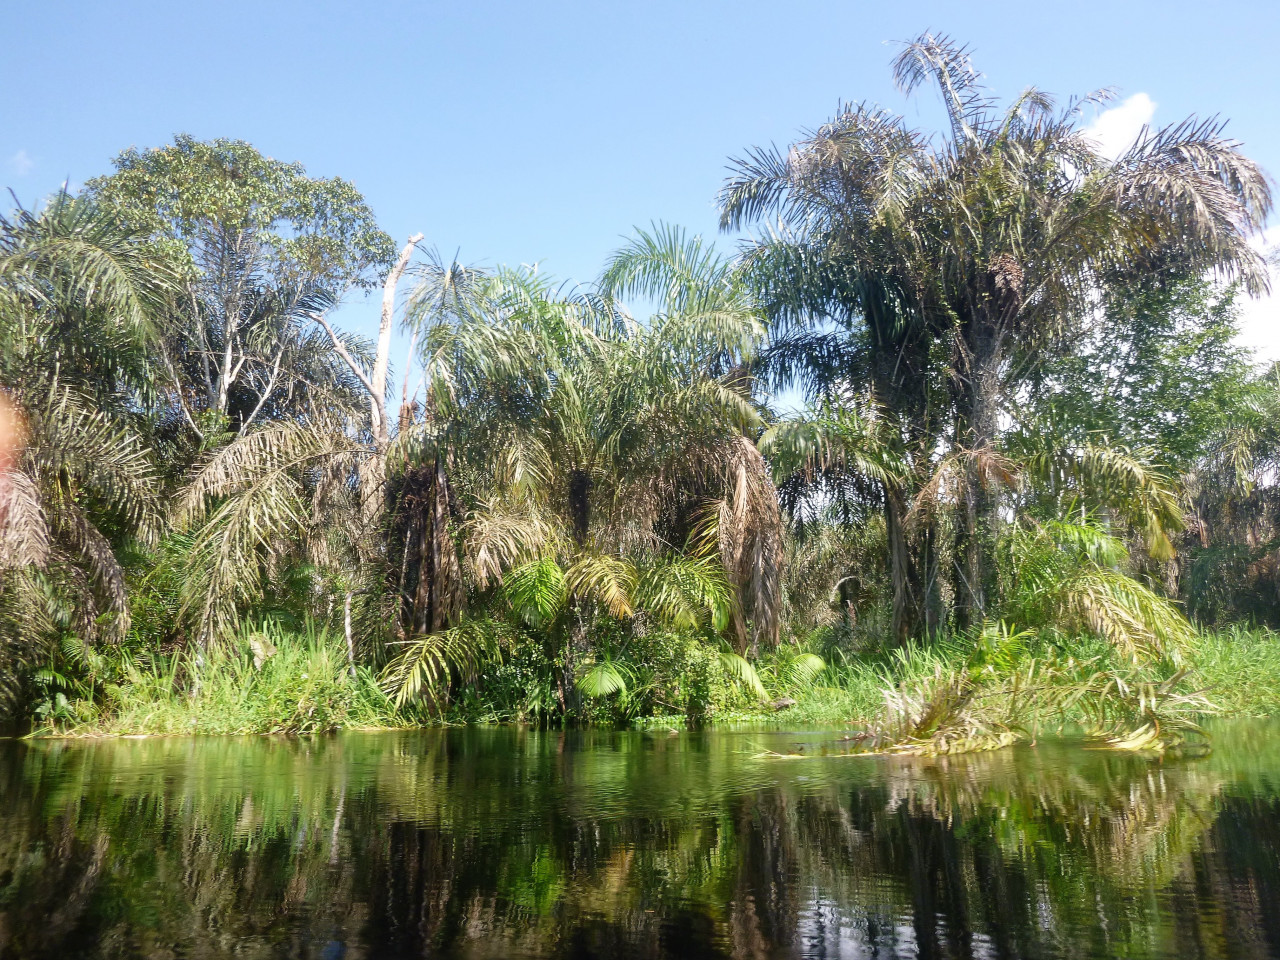 La rivière Ibenga entre Enyellé et Moyoko. (© Clarisse LHEZ))